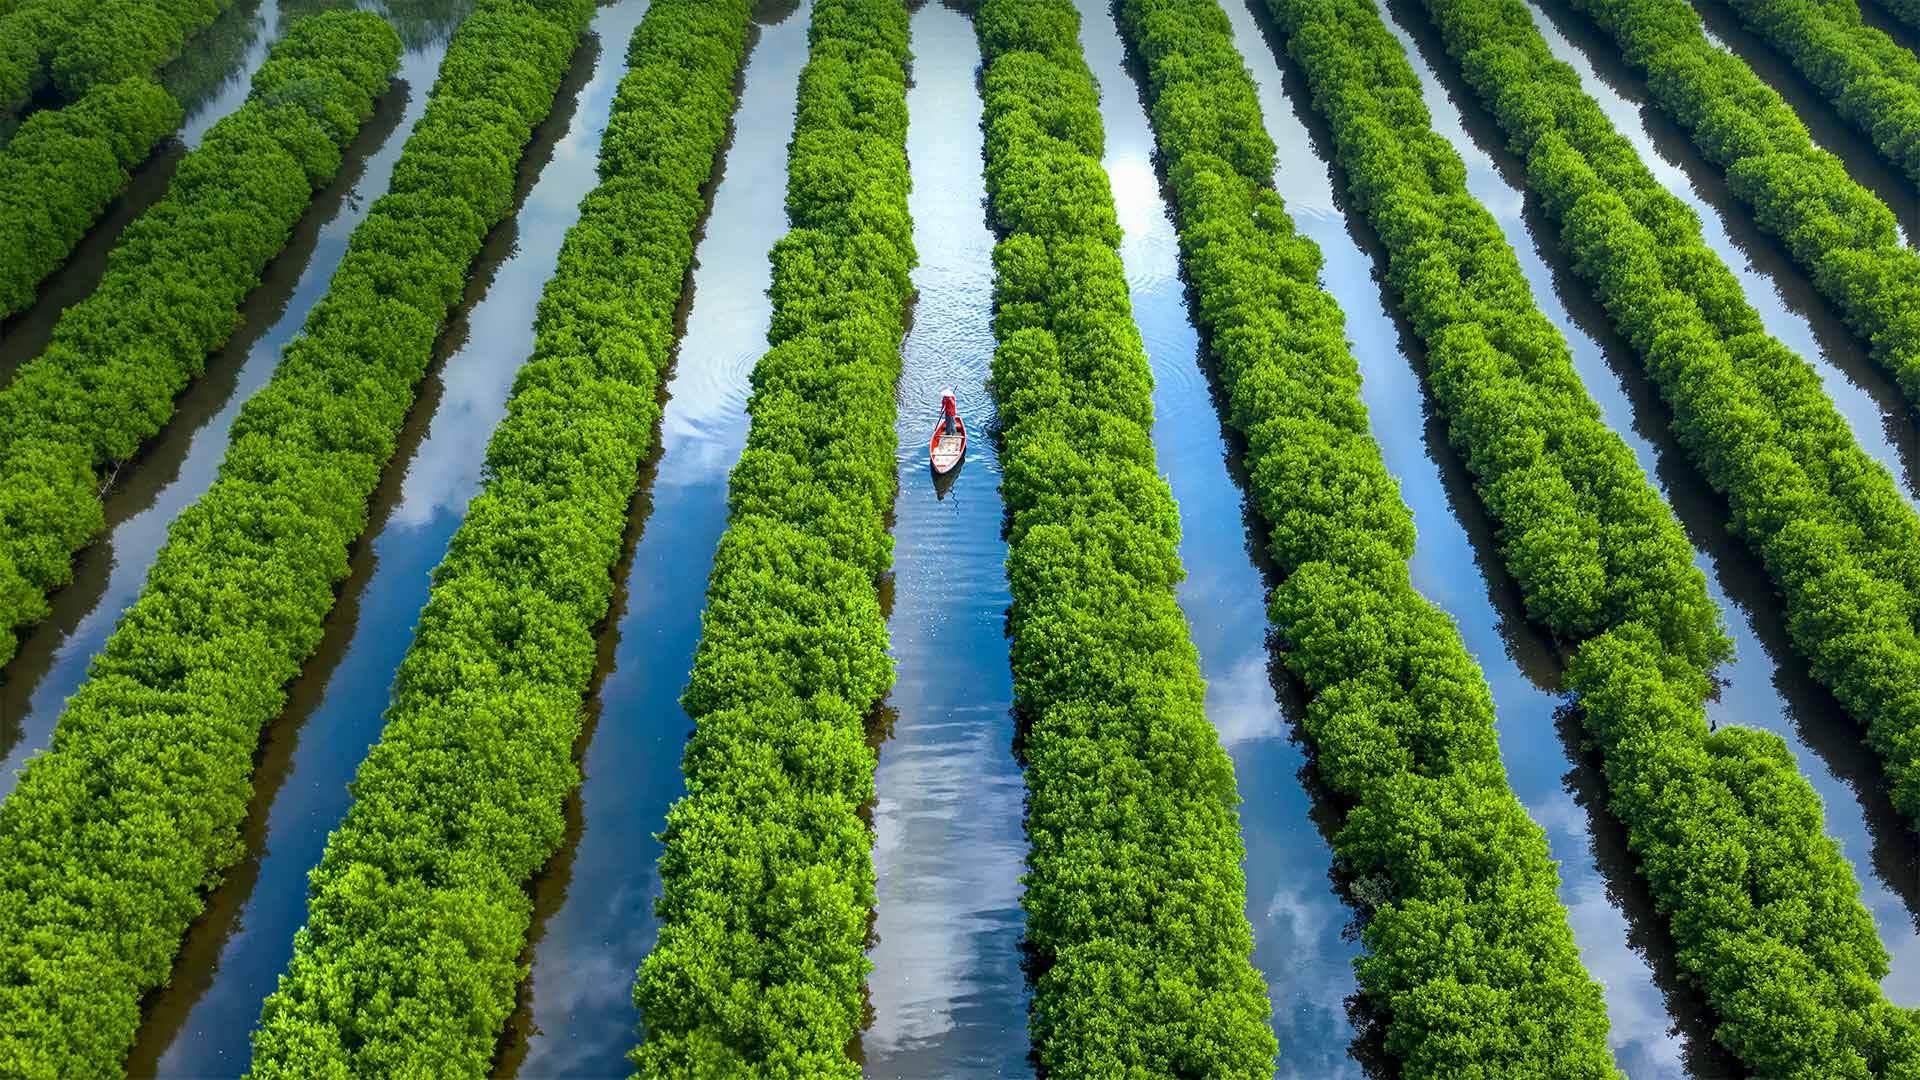 Bàu Cá Cái的红树林越南广义